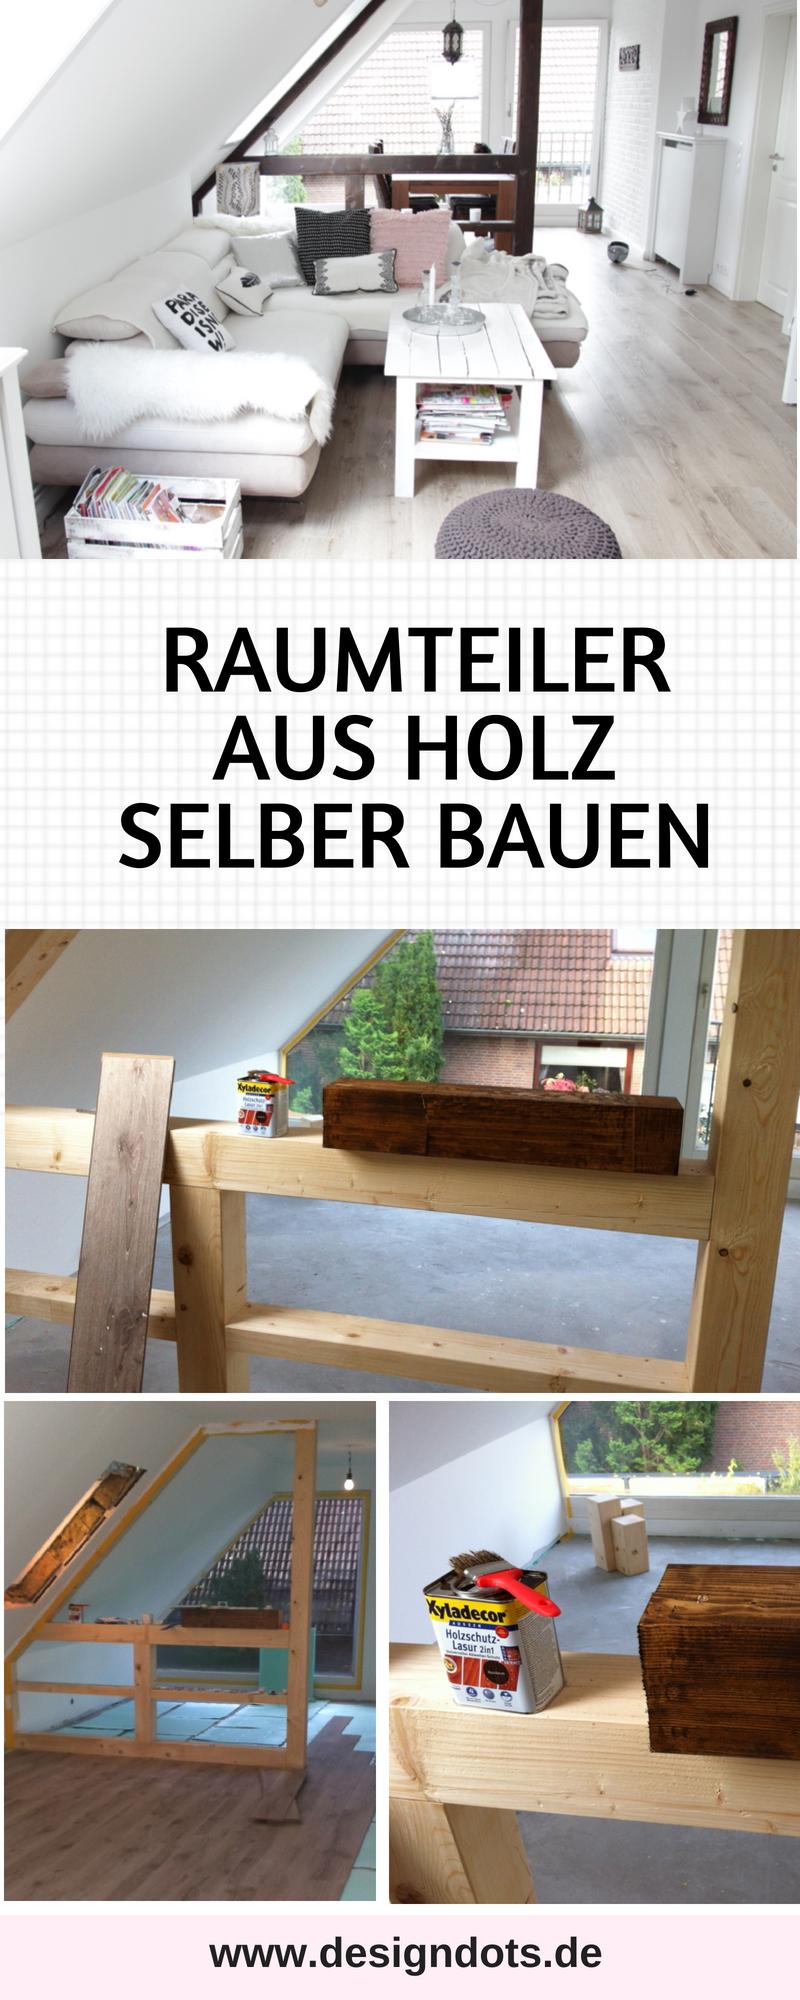 raumteiler selber basteln raumteiler kai with raumteiler selber basteln trendy ideen fr. Black Bedroom Furniture Sets. Home Design Ideas